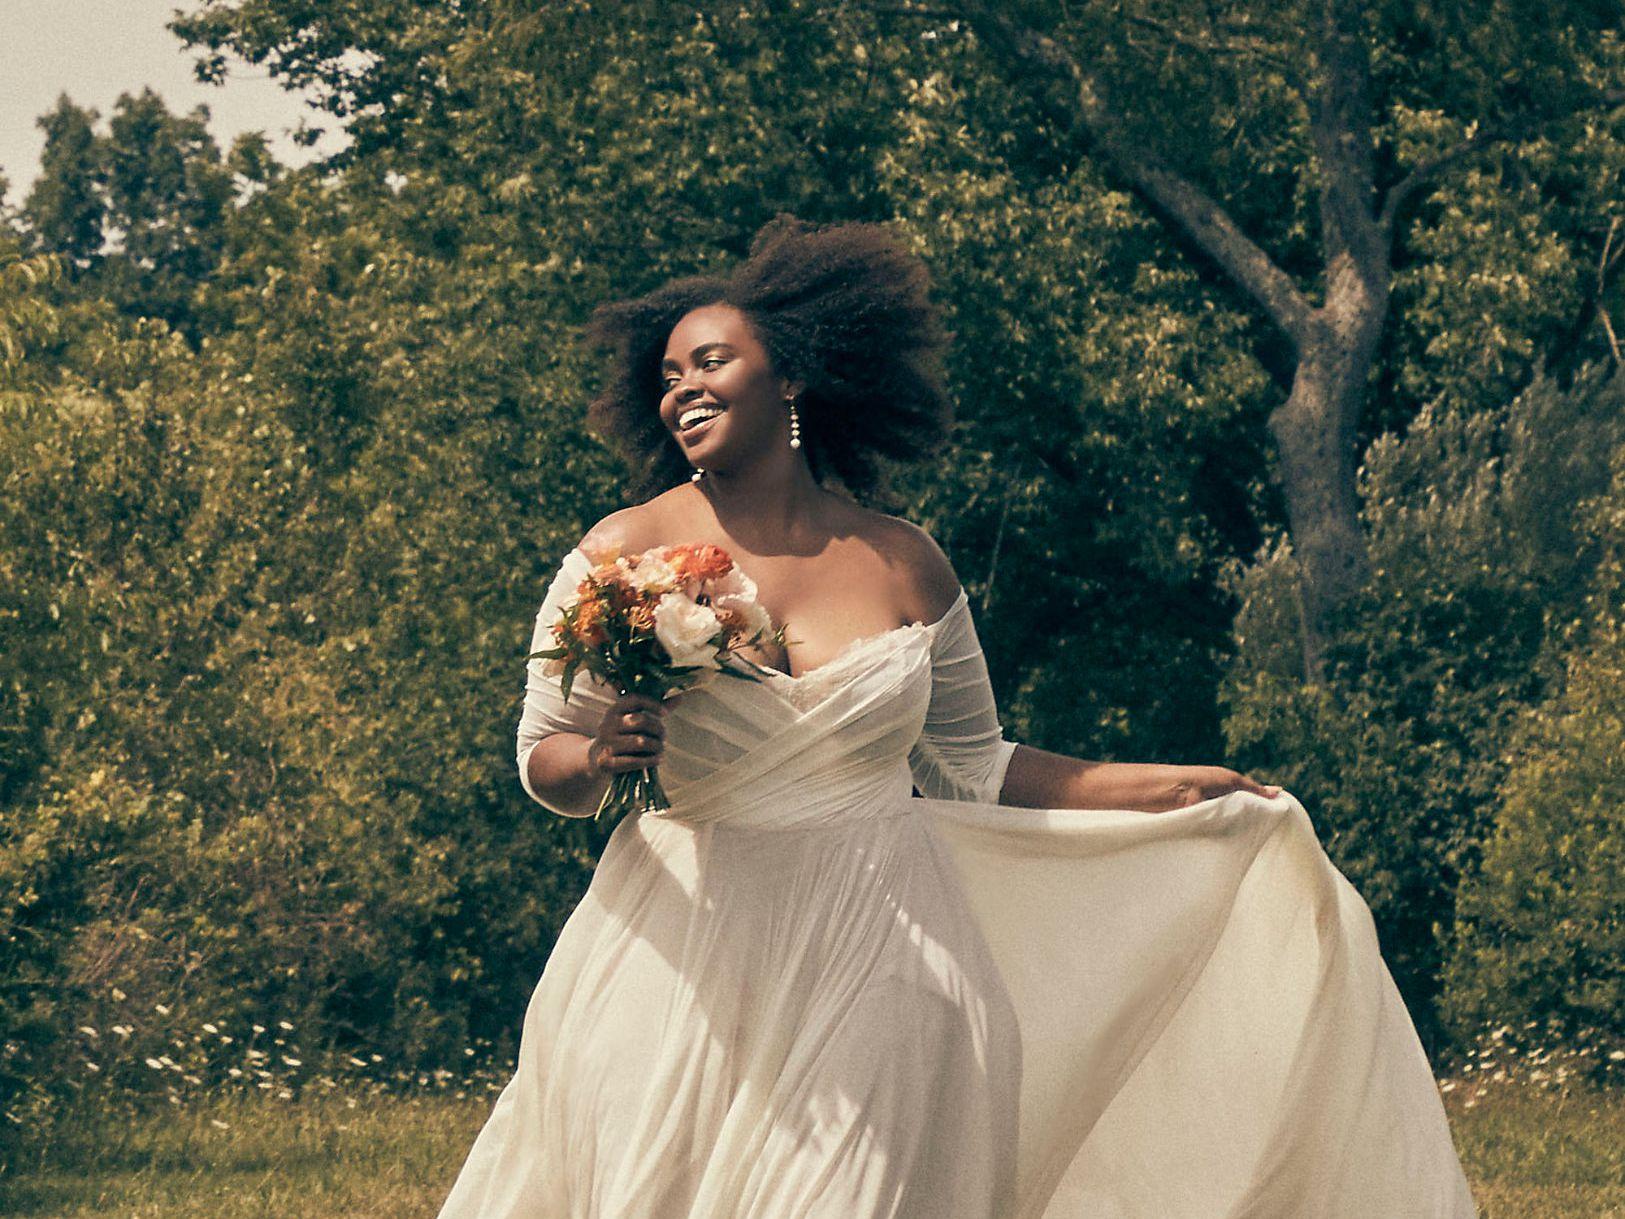 20 Best Long Sleeved Wedding Dresses of 20